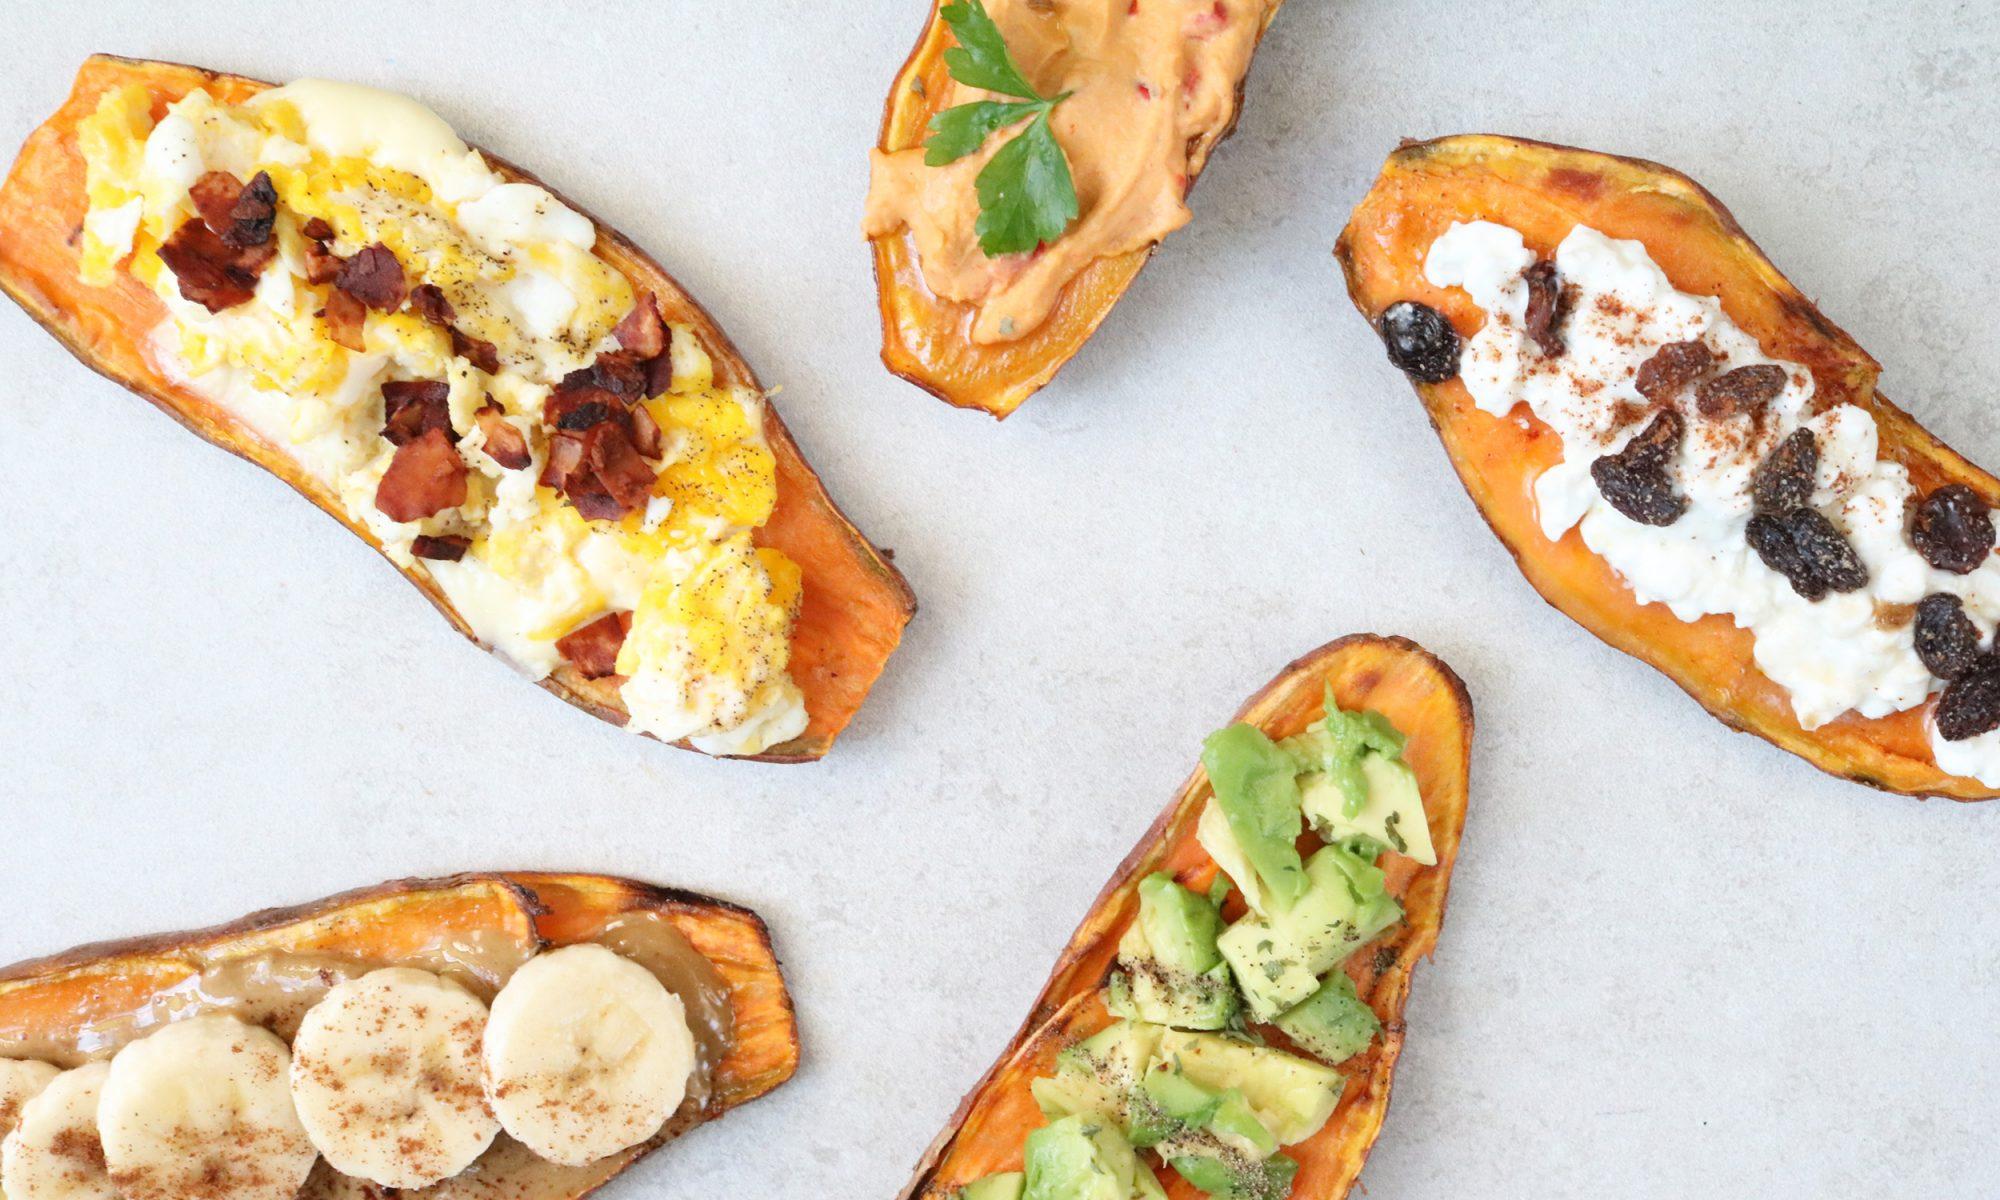 EC: 5 Ways to Make Sweet Potato Toast a.k.a. Avocado Toast's Weird Cousin